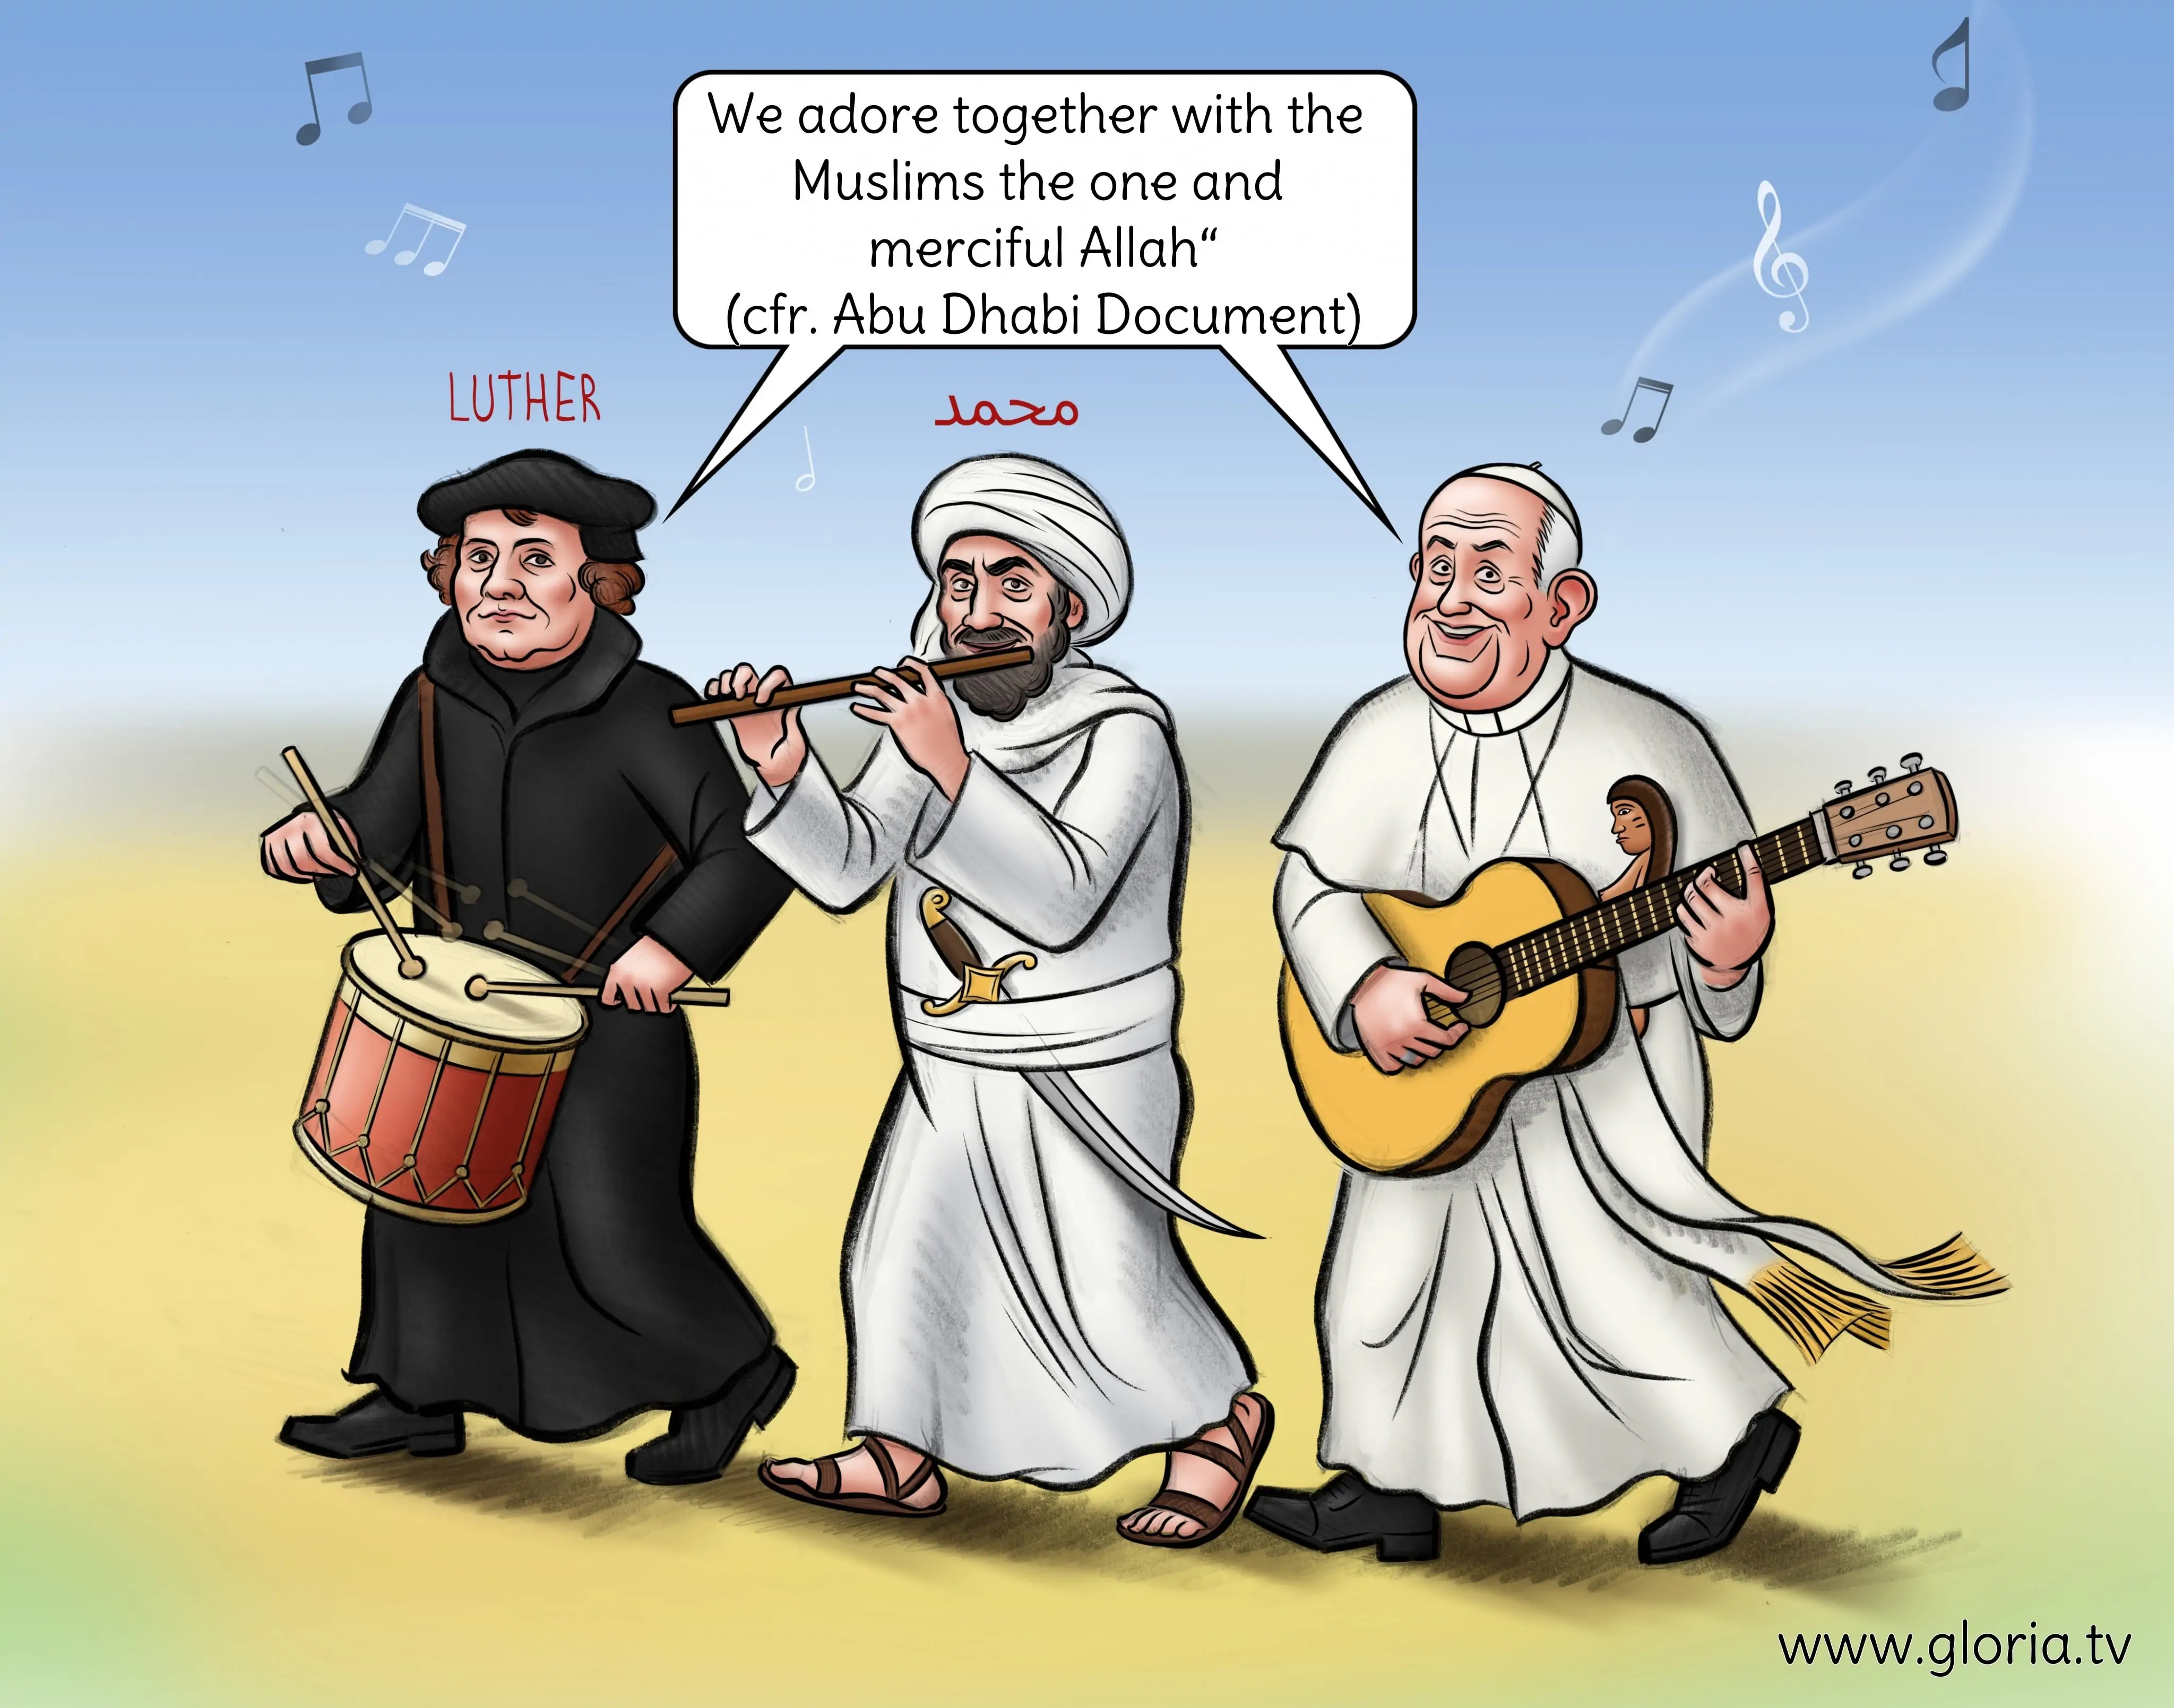 Pseudopapież Bergoglio, Luter i mahometanin